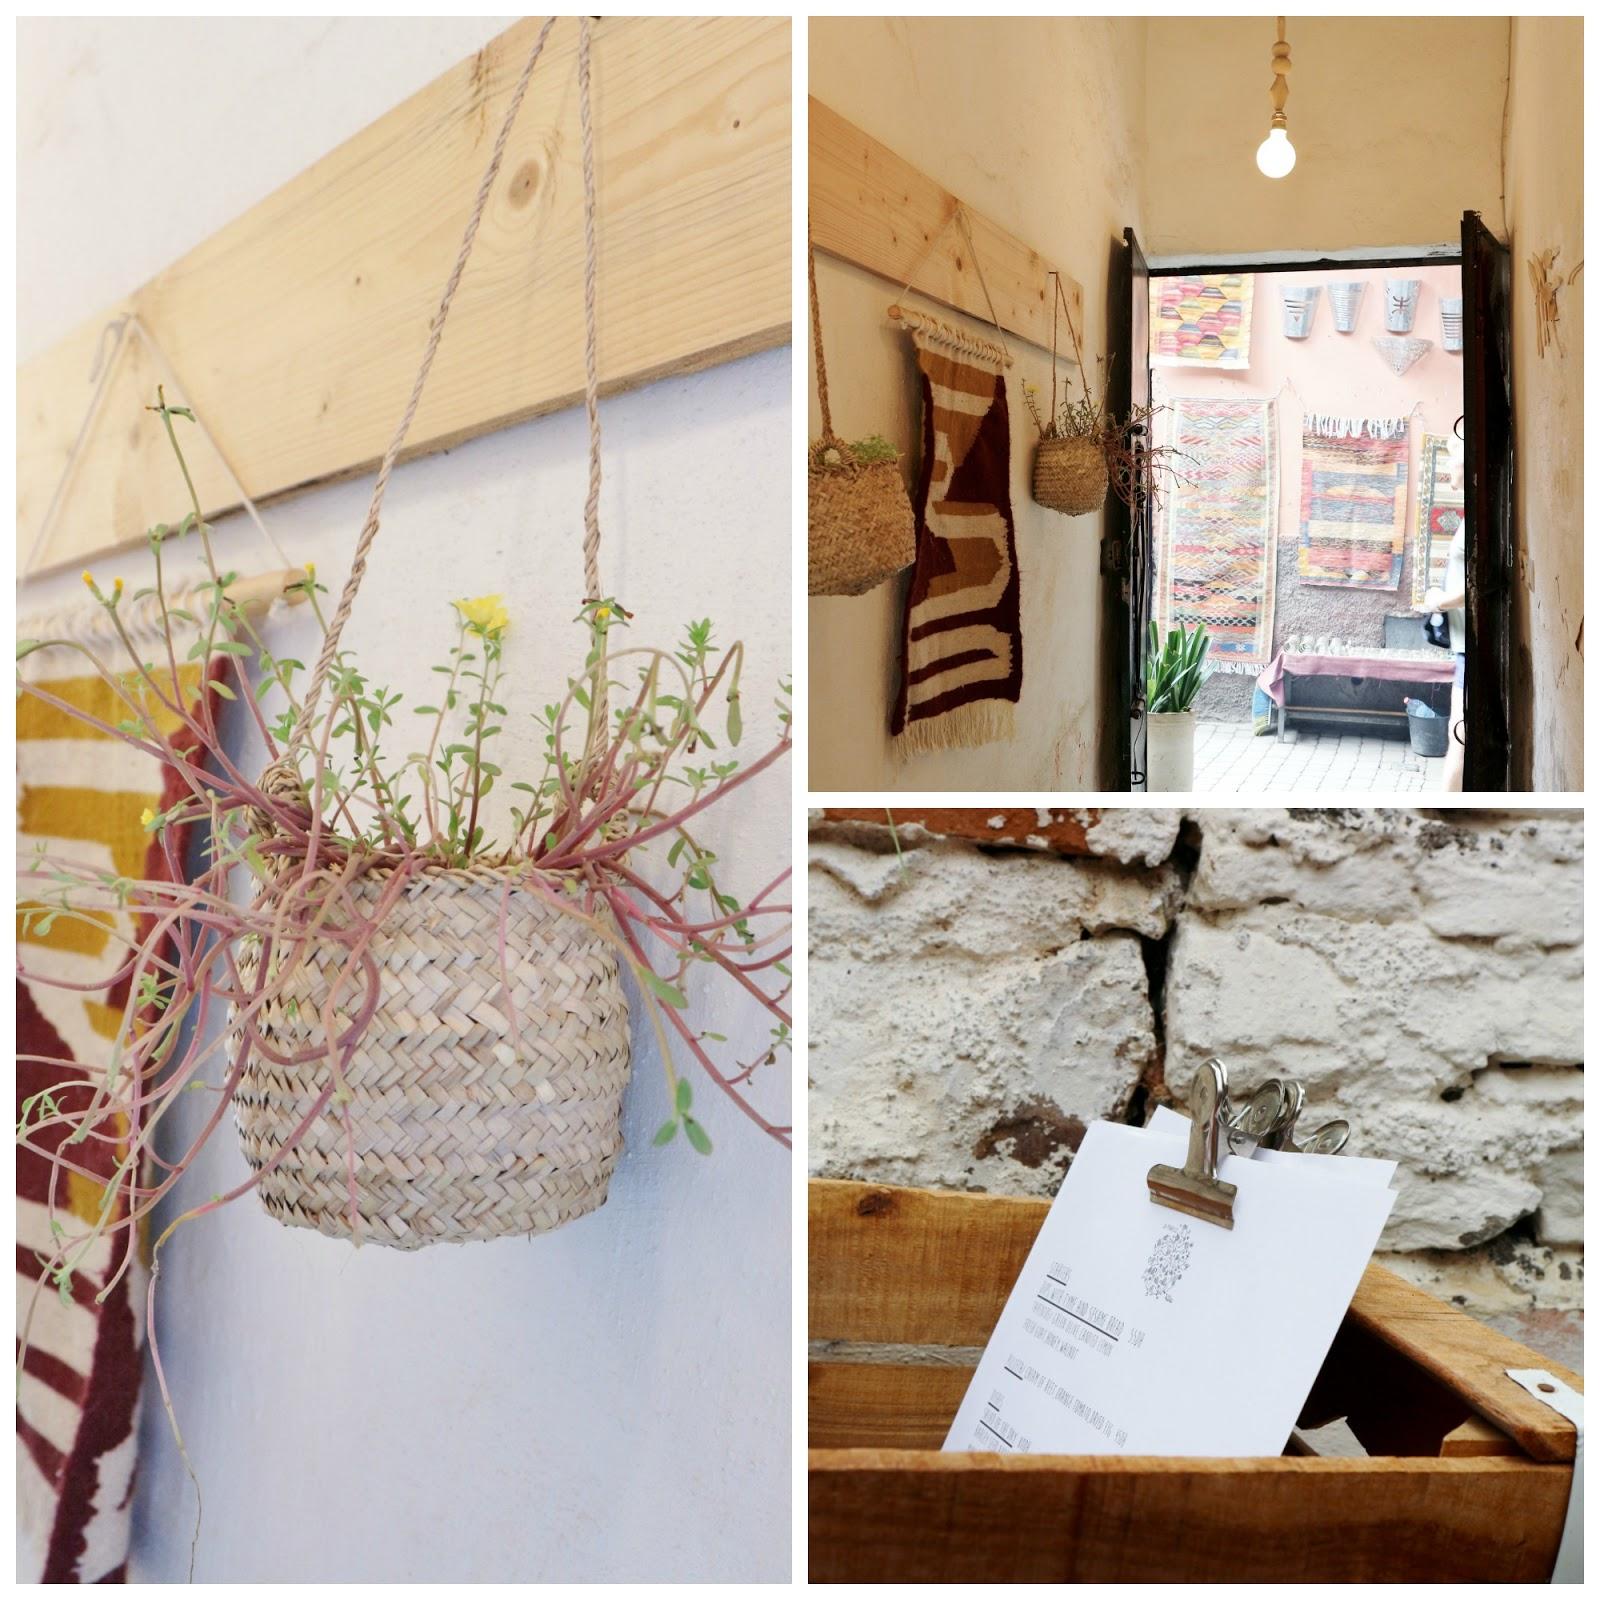 atelier rue verte le blog marrakech mes bonnes adresses d co caf restau. Black Bedroom Furniture Sets. Home Design Ideas